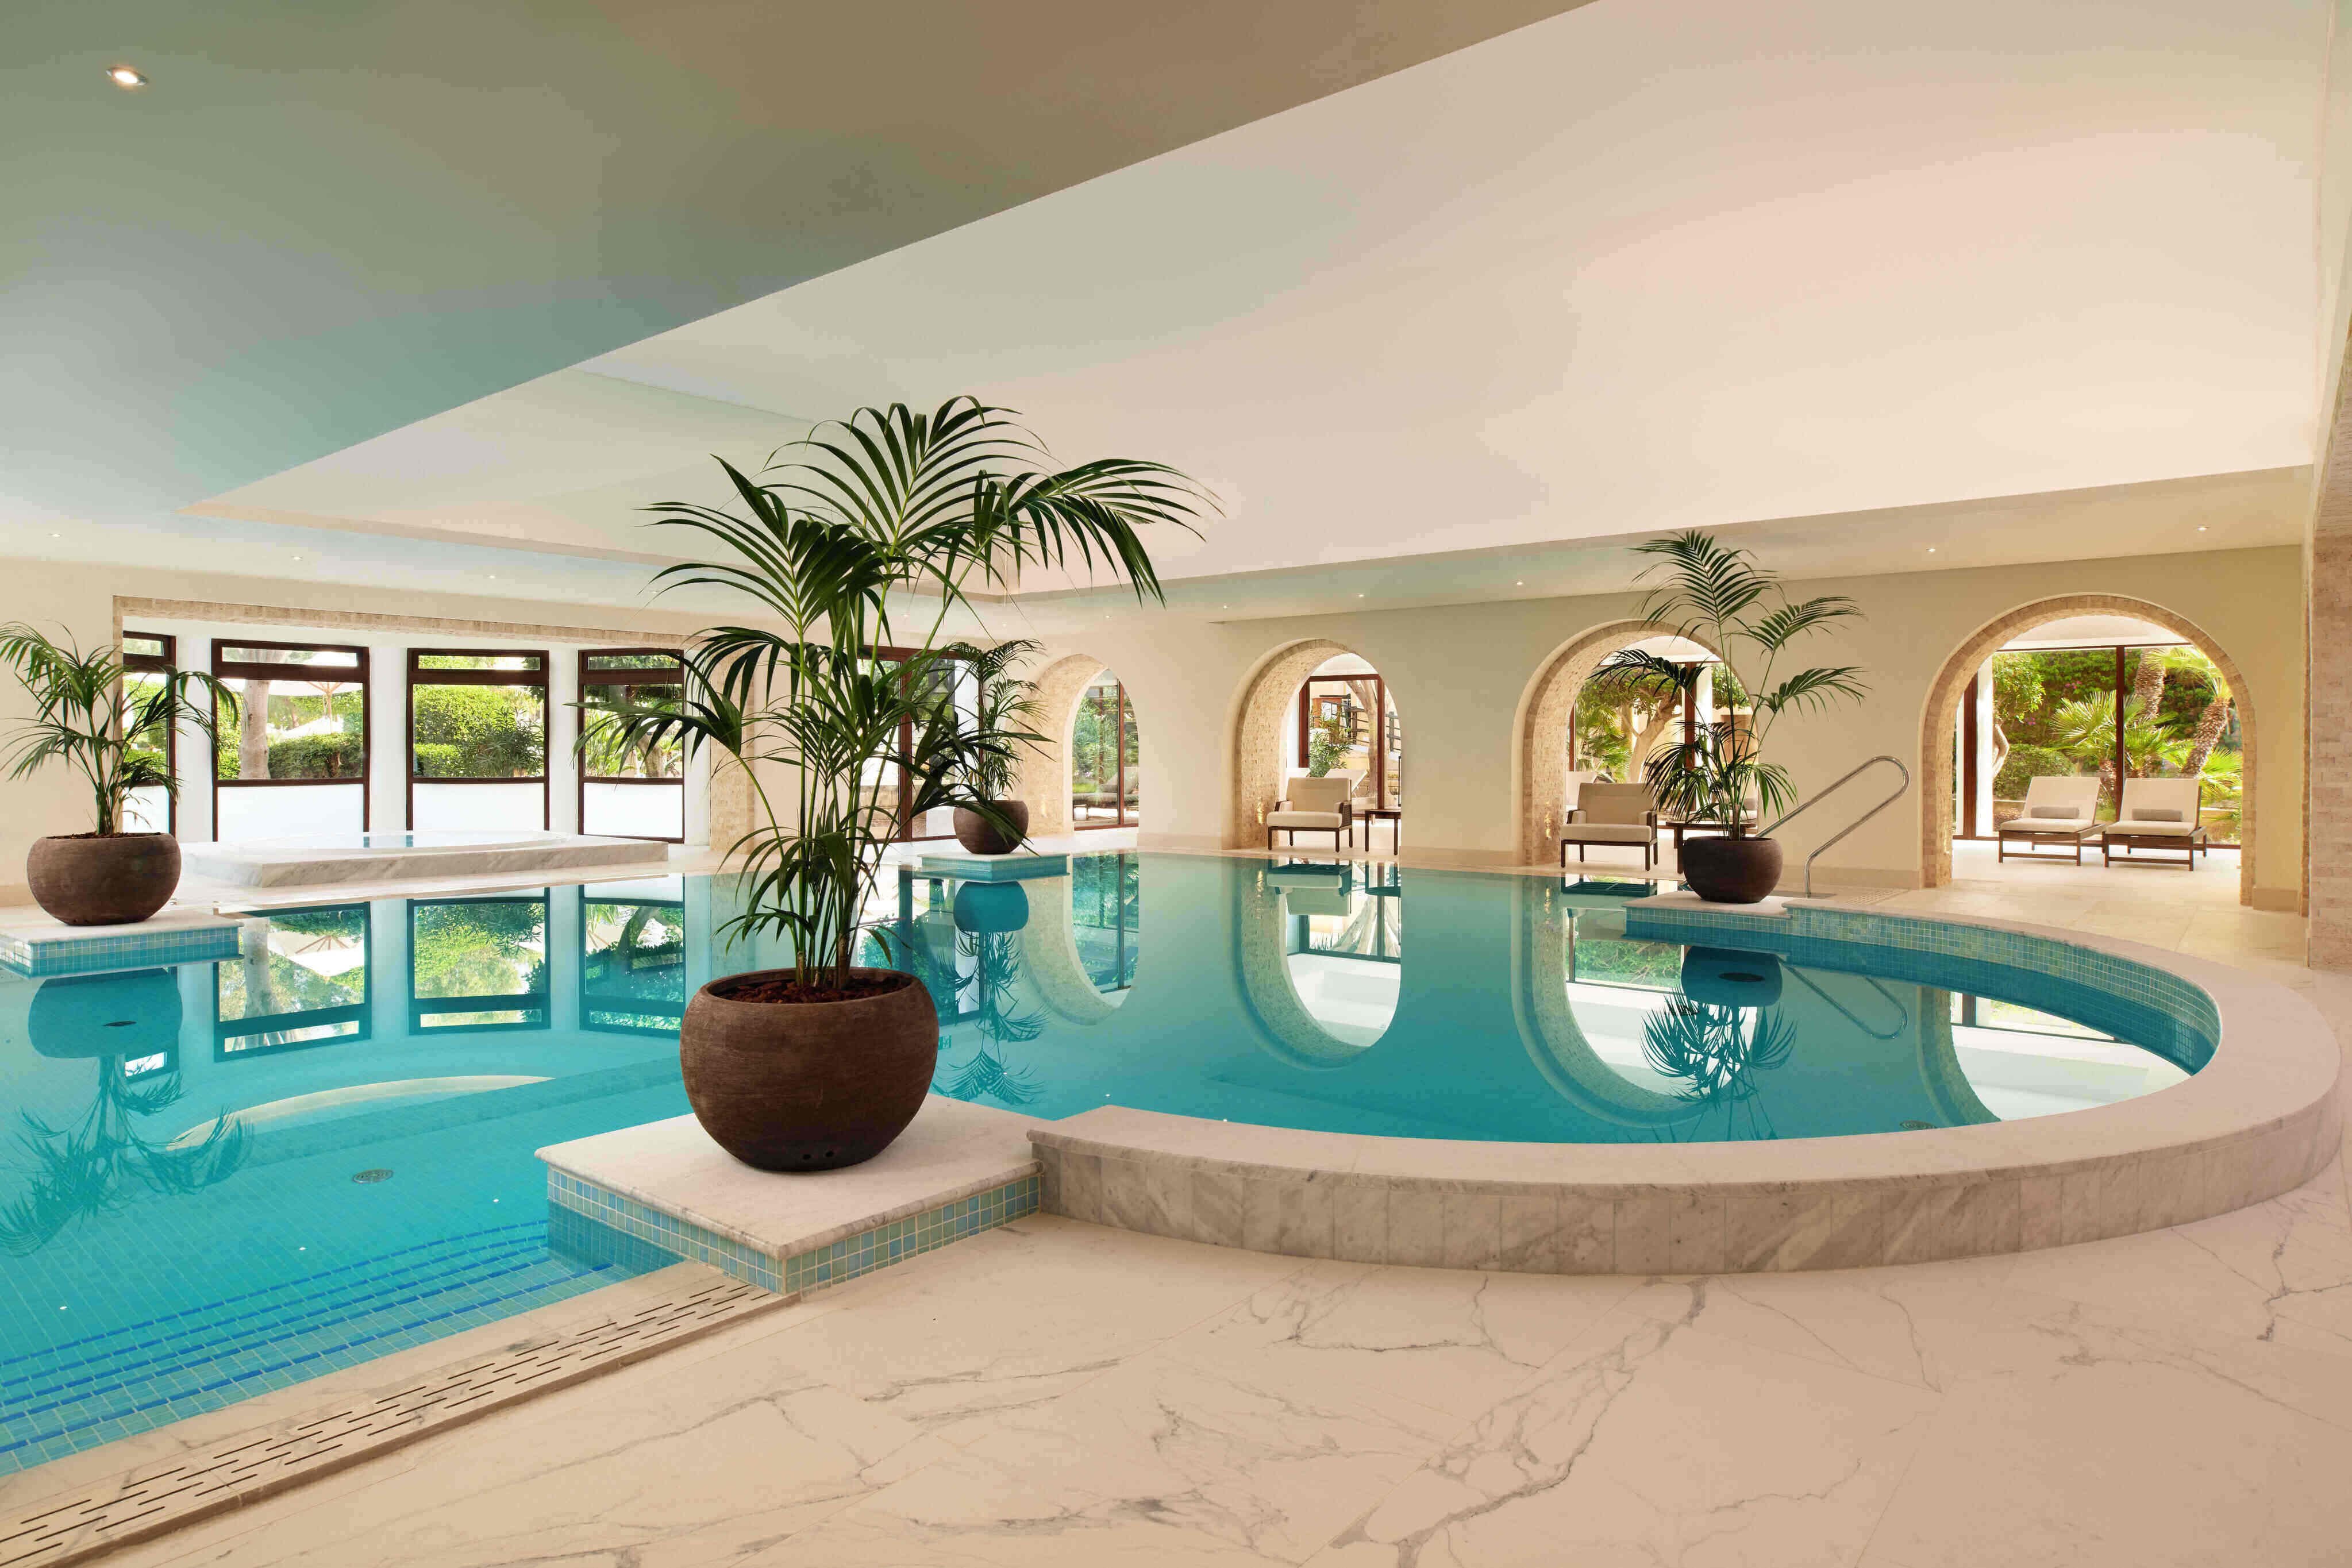 corinthia, palace, malta, accommodation, hotel, lgbt, gay, friendly